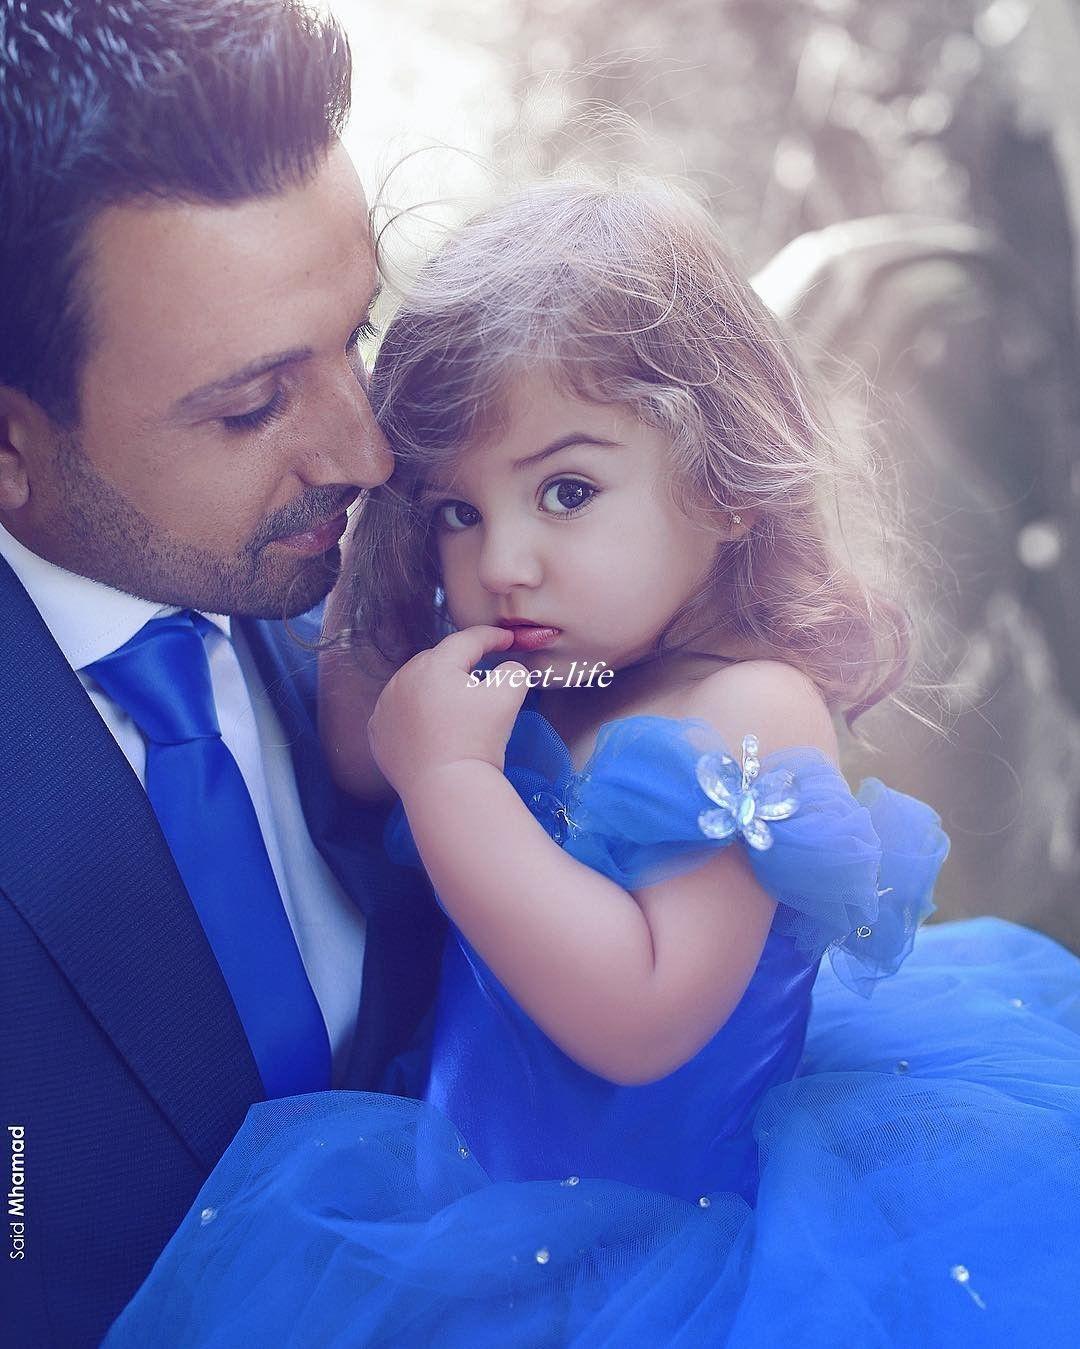 Royal Blue Princess Wedding Flower Girl Dresses Puffy Tutu Off Shoulder Sparkly Crystals 2020 Toddler Little Girls Pageant Communion Dress